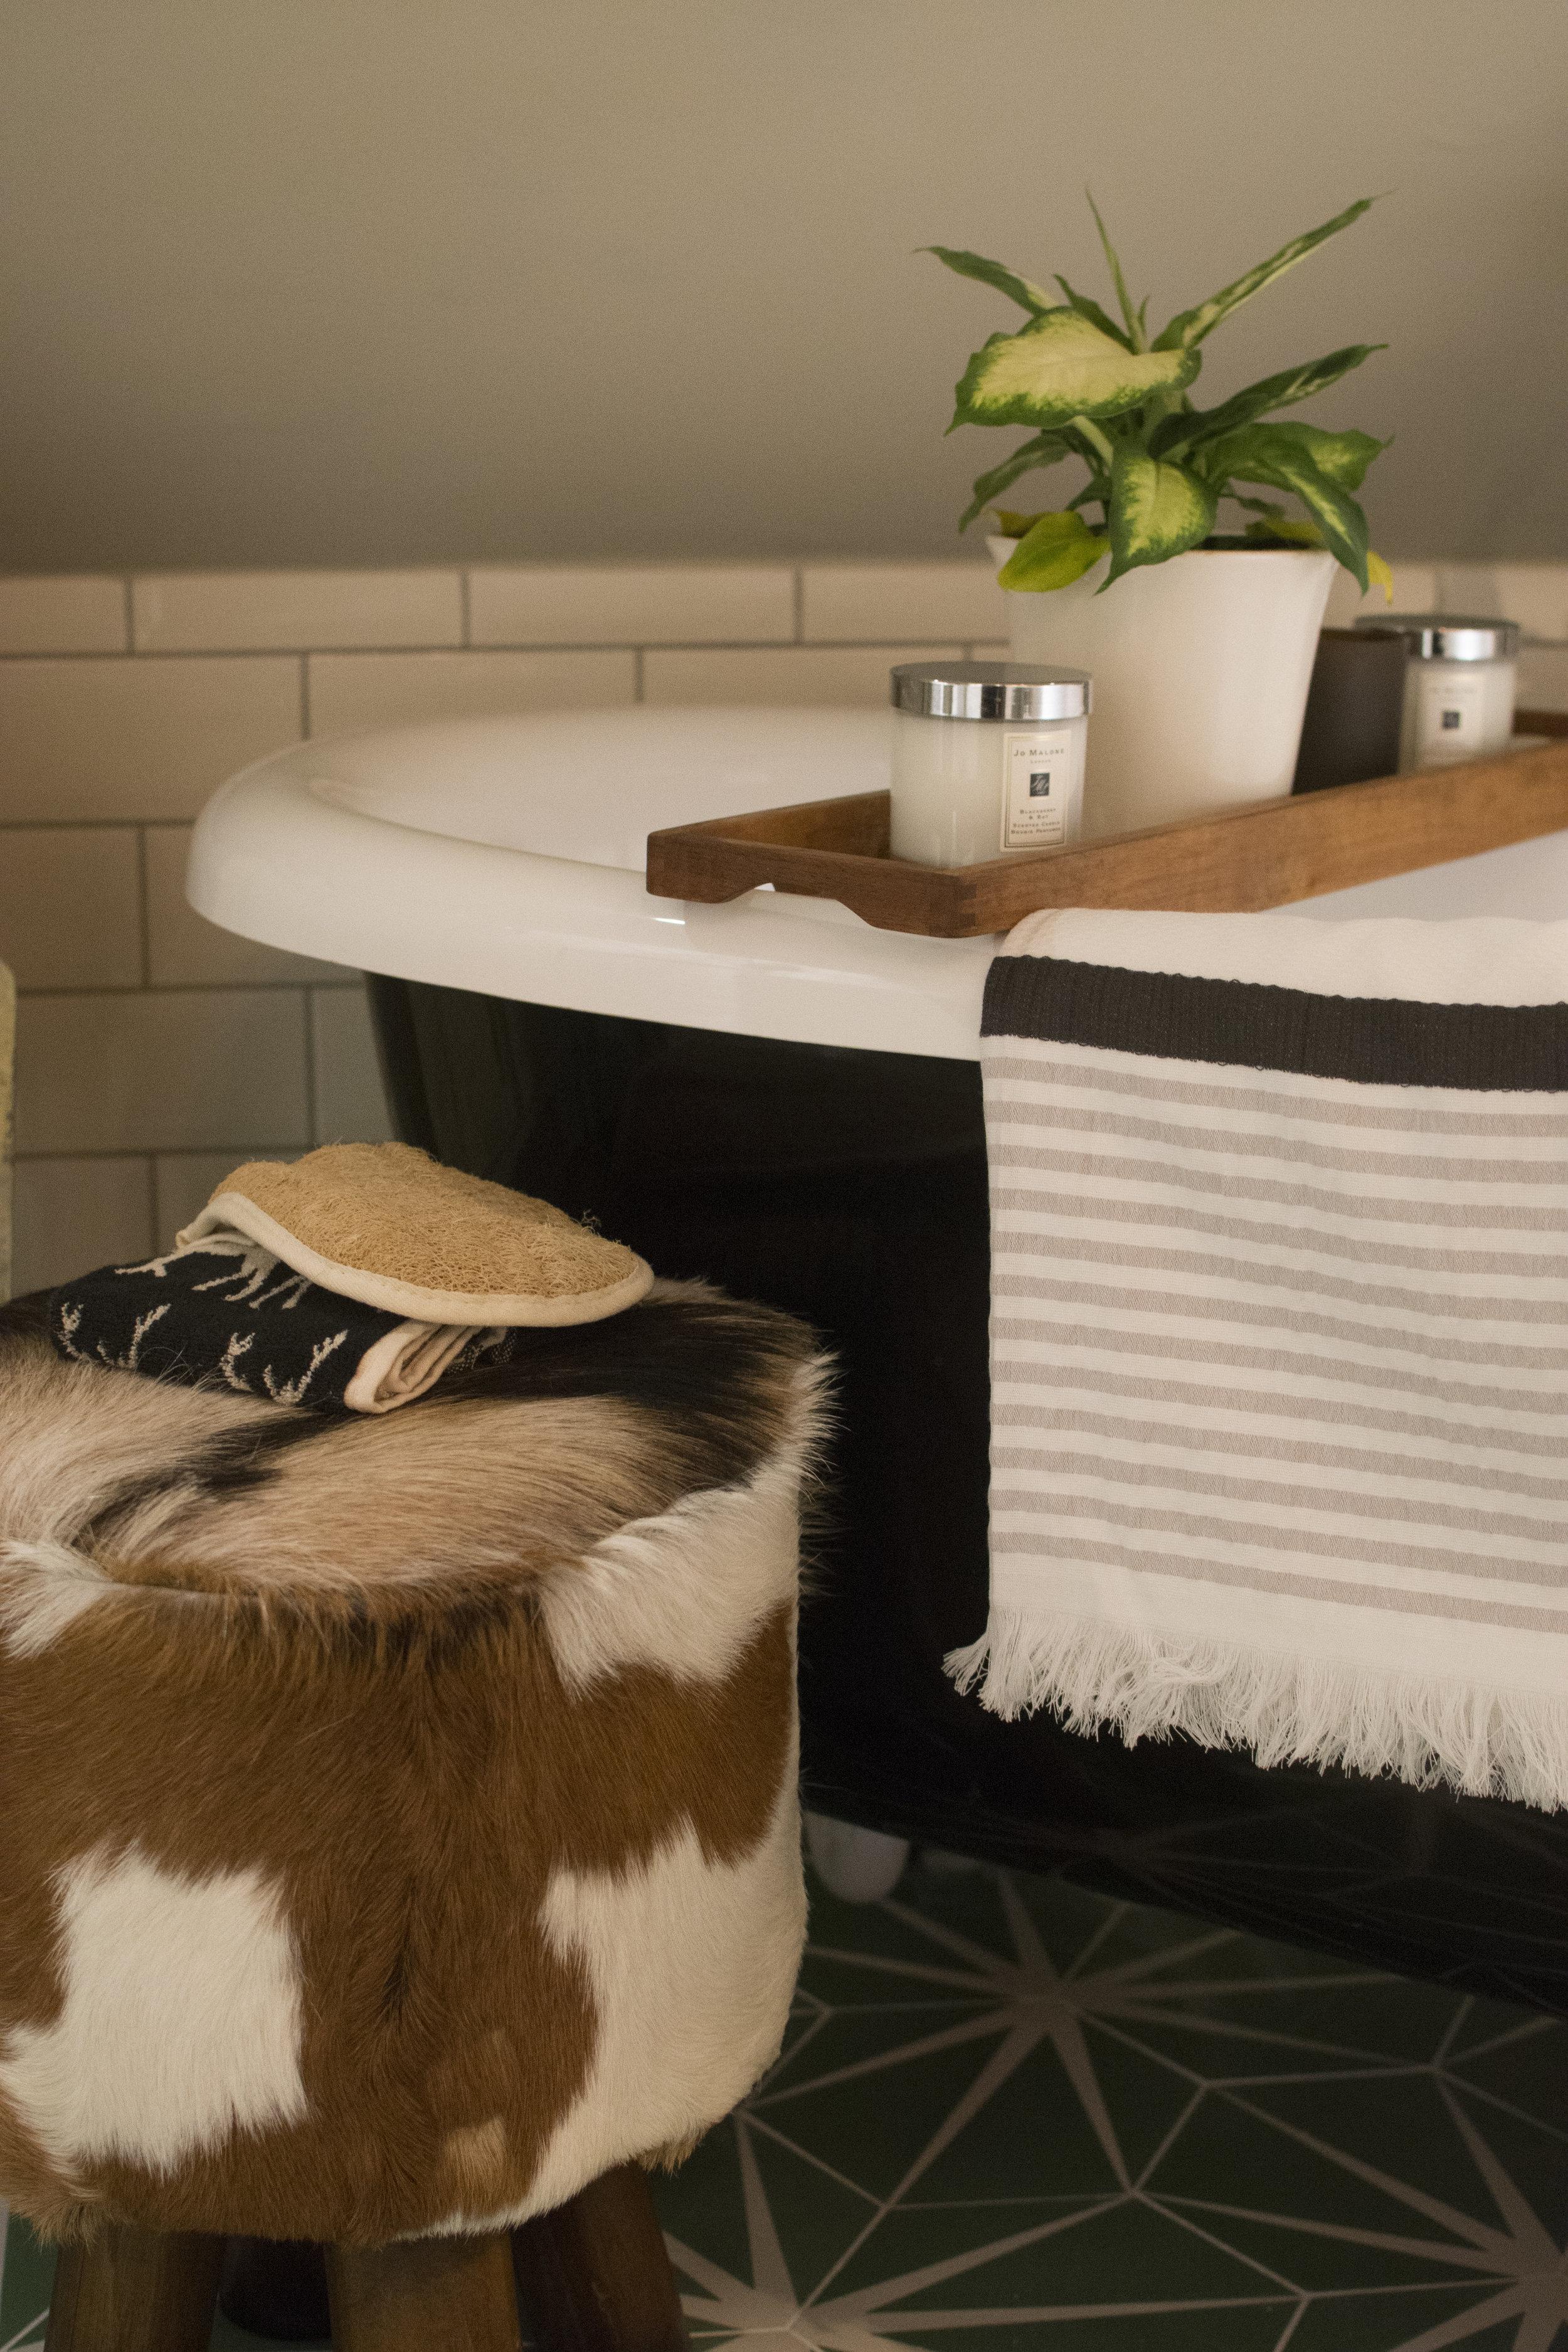 The Maroc towel hung over my bath tub.